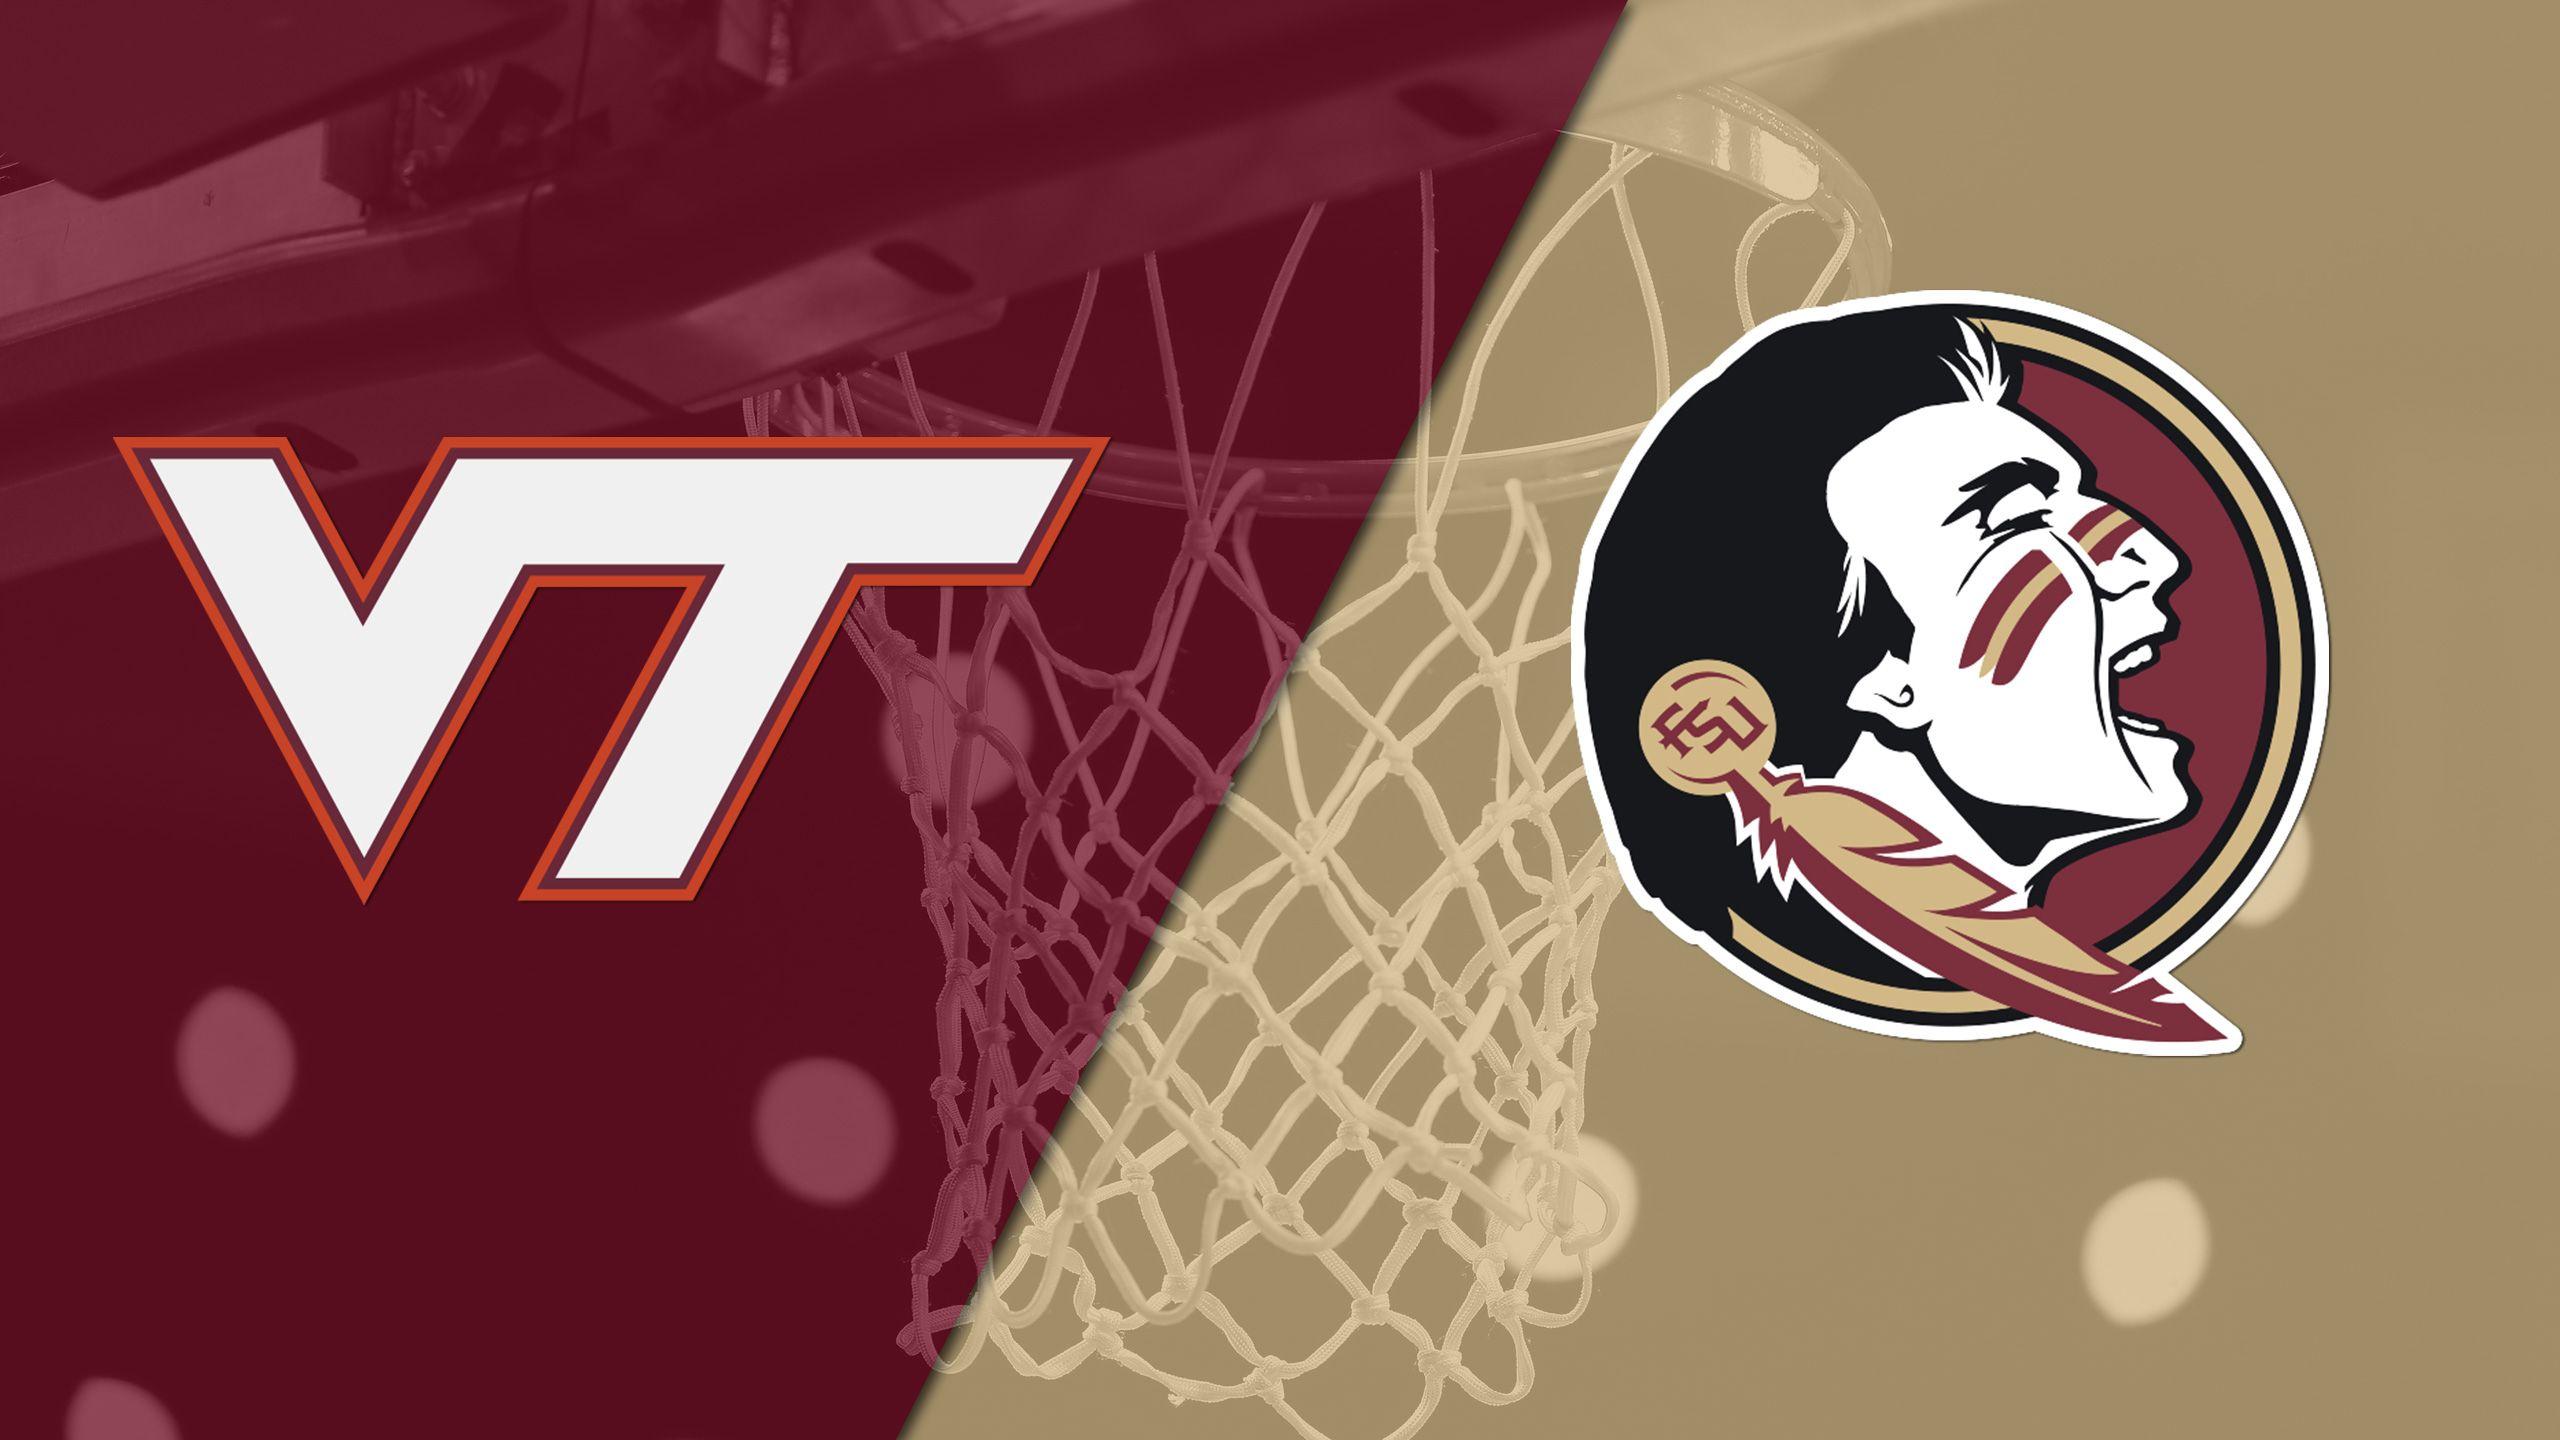 #21 Virginia Tech vs. #12 Florida State (M Basketball)